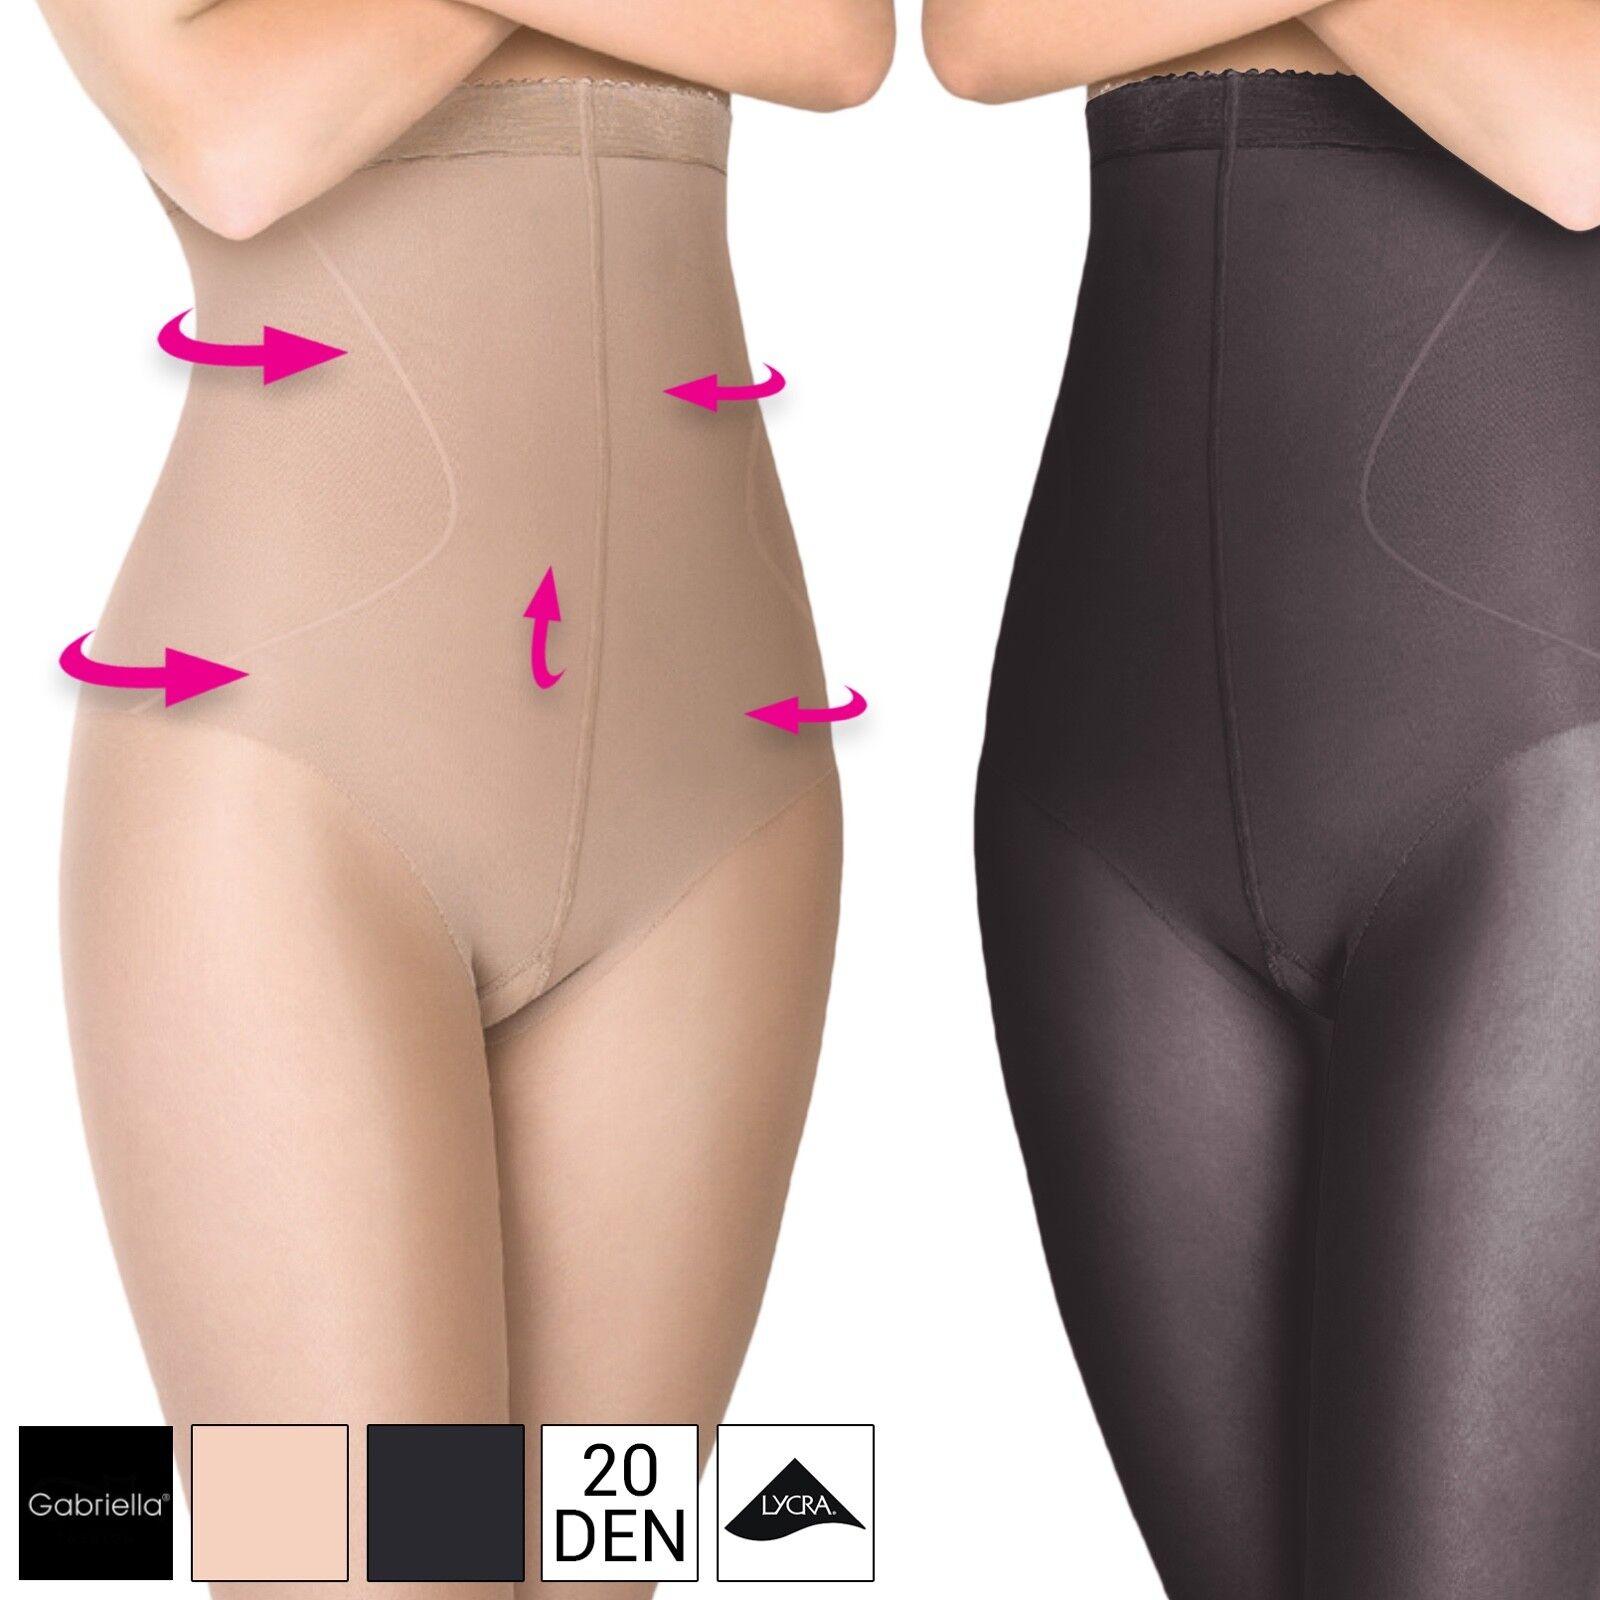 Bauch-Weg Strumpfhose Push-Up Korrektur Po Lift-Up Figurformende Shapewear 20DEN